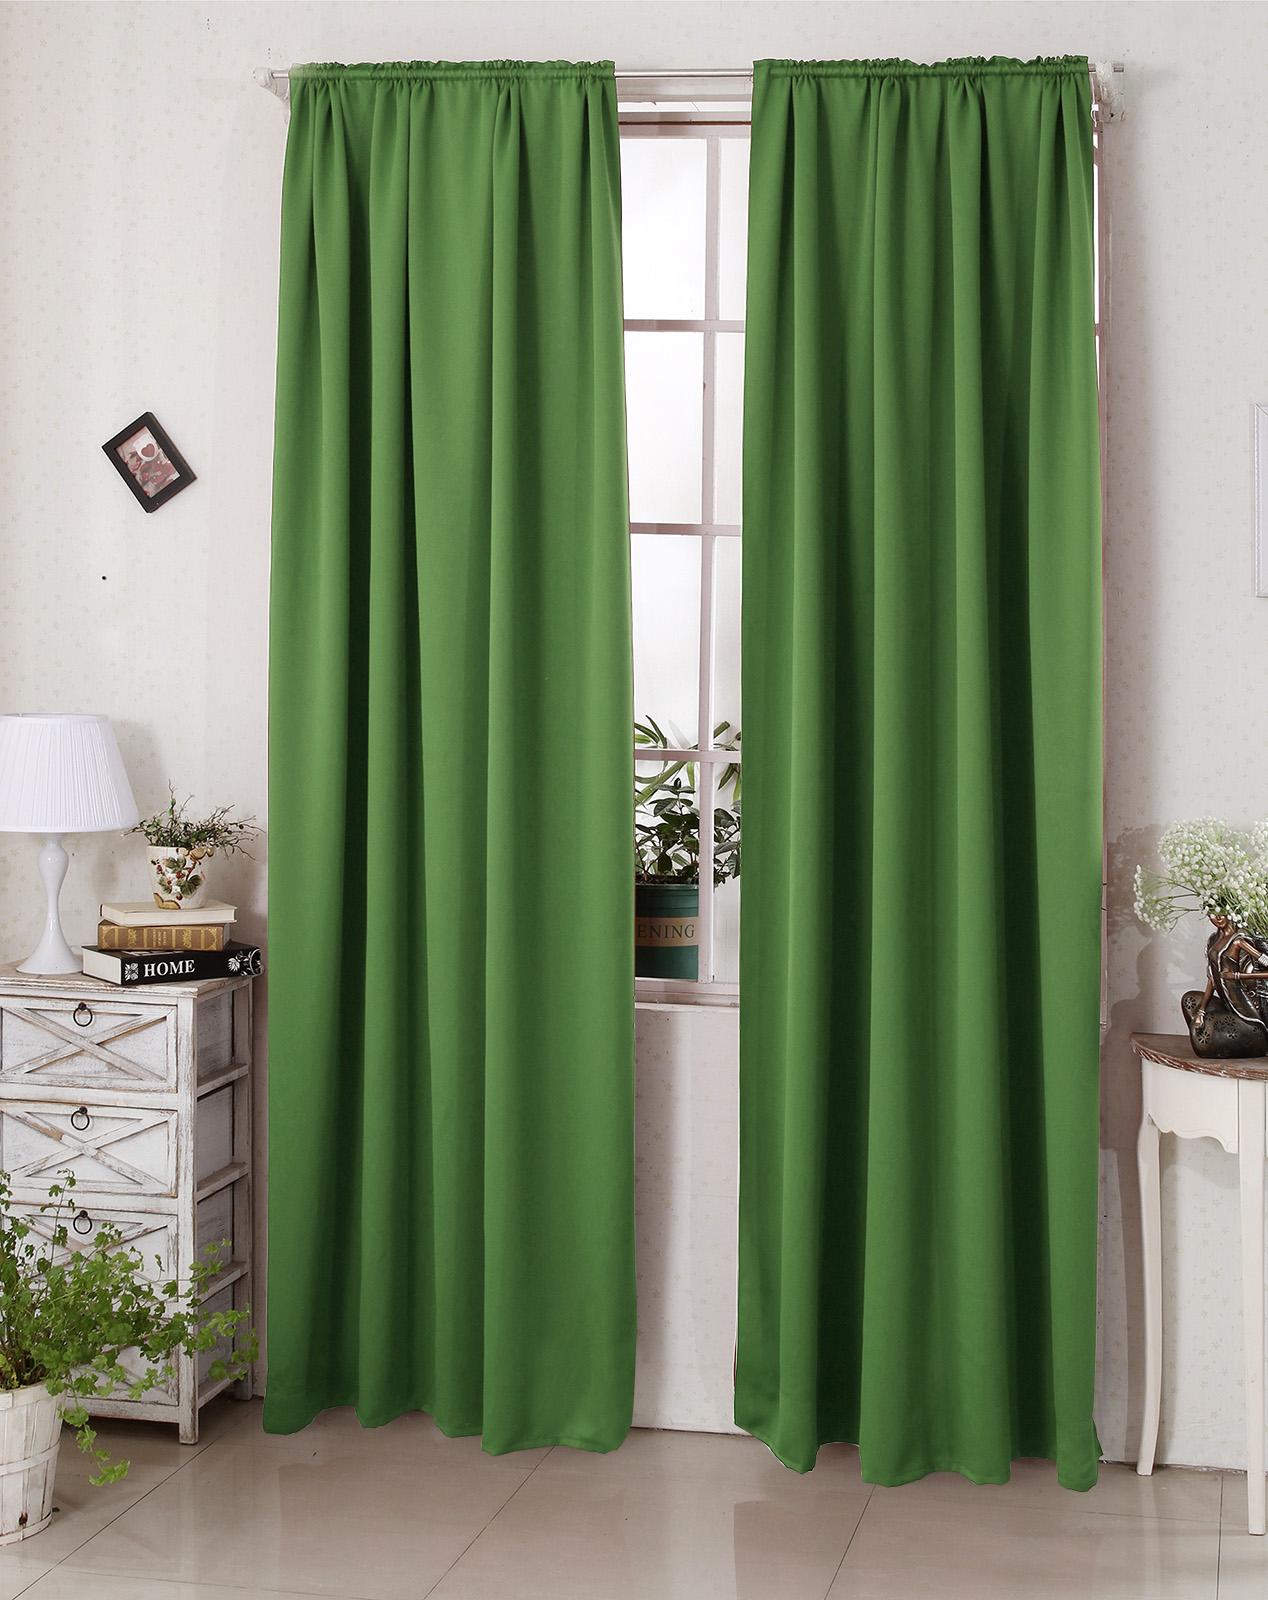 gardinen vorhang blickdicht kr uselband thermogardine verdunkelungsgardine 330 ebay. Black Bedroom Furniture Sets. Home Design Ideas